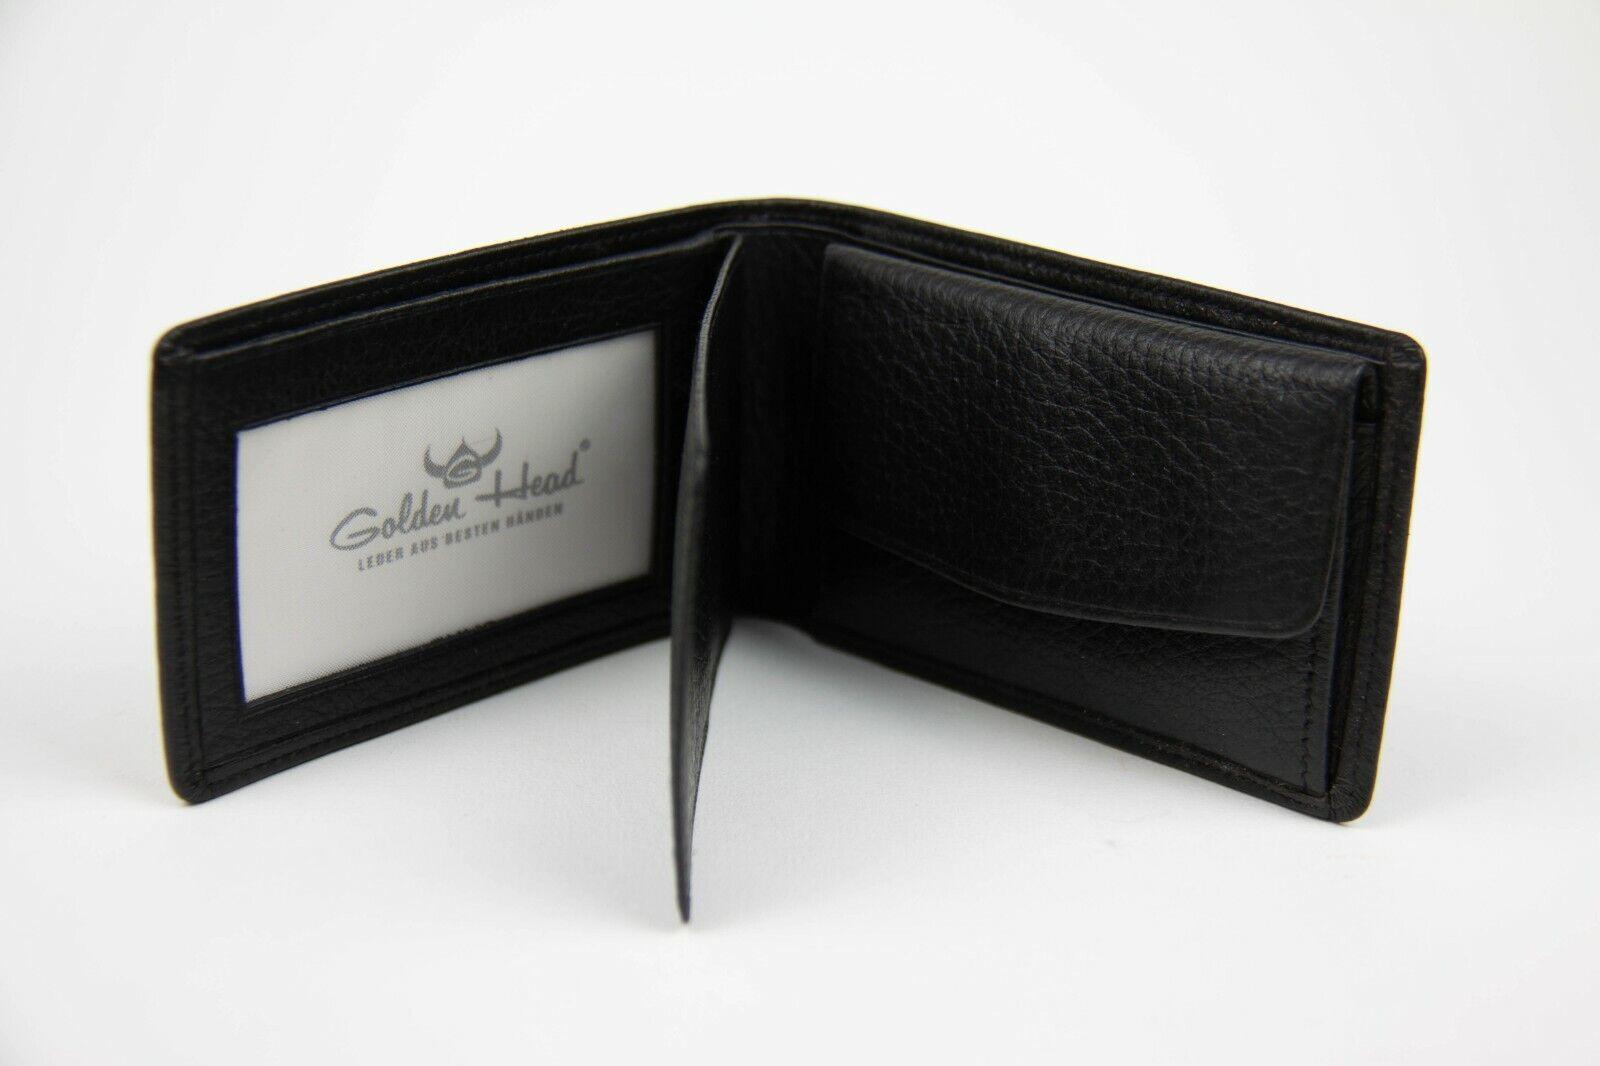 Golden Head Leather Wallet Small Soft Black Handy Men France